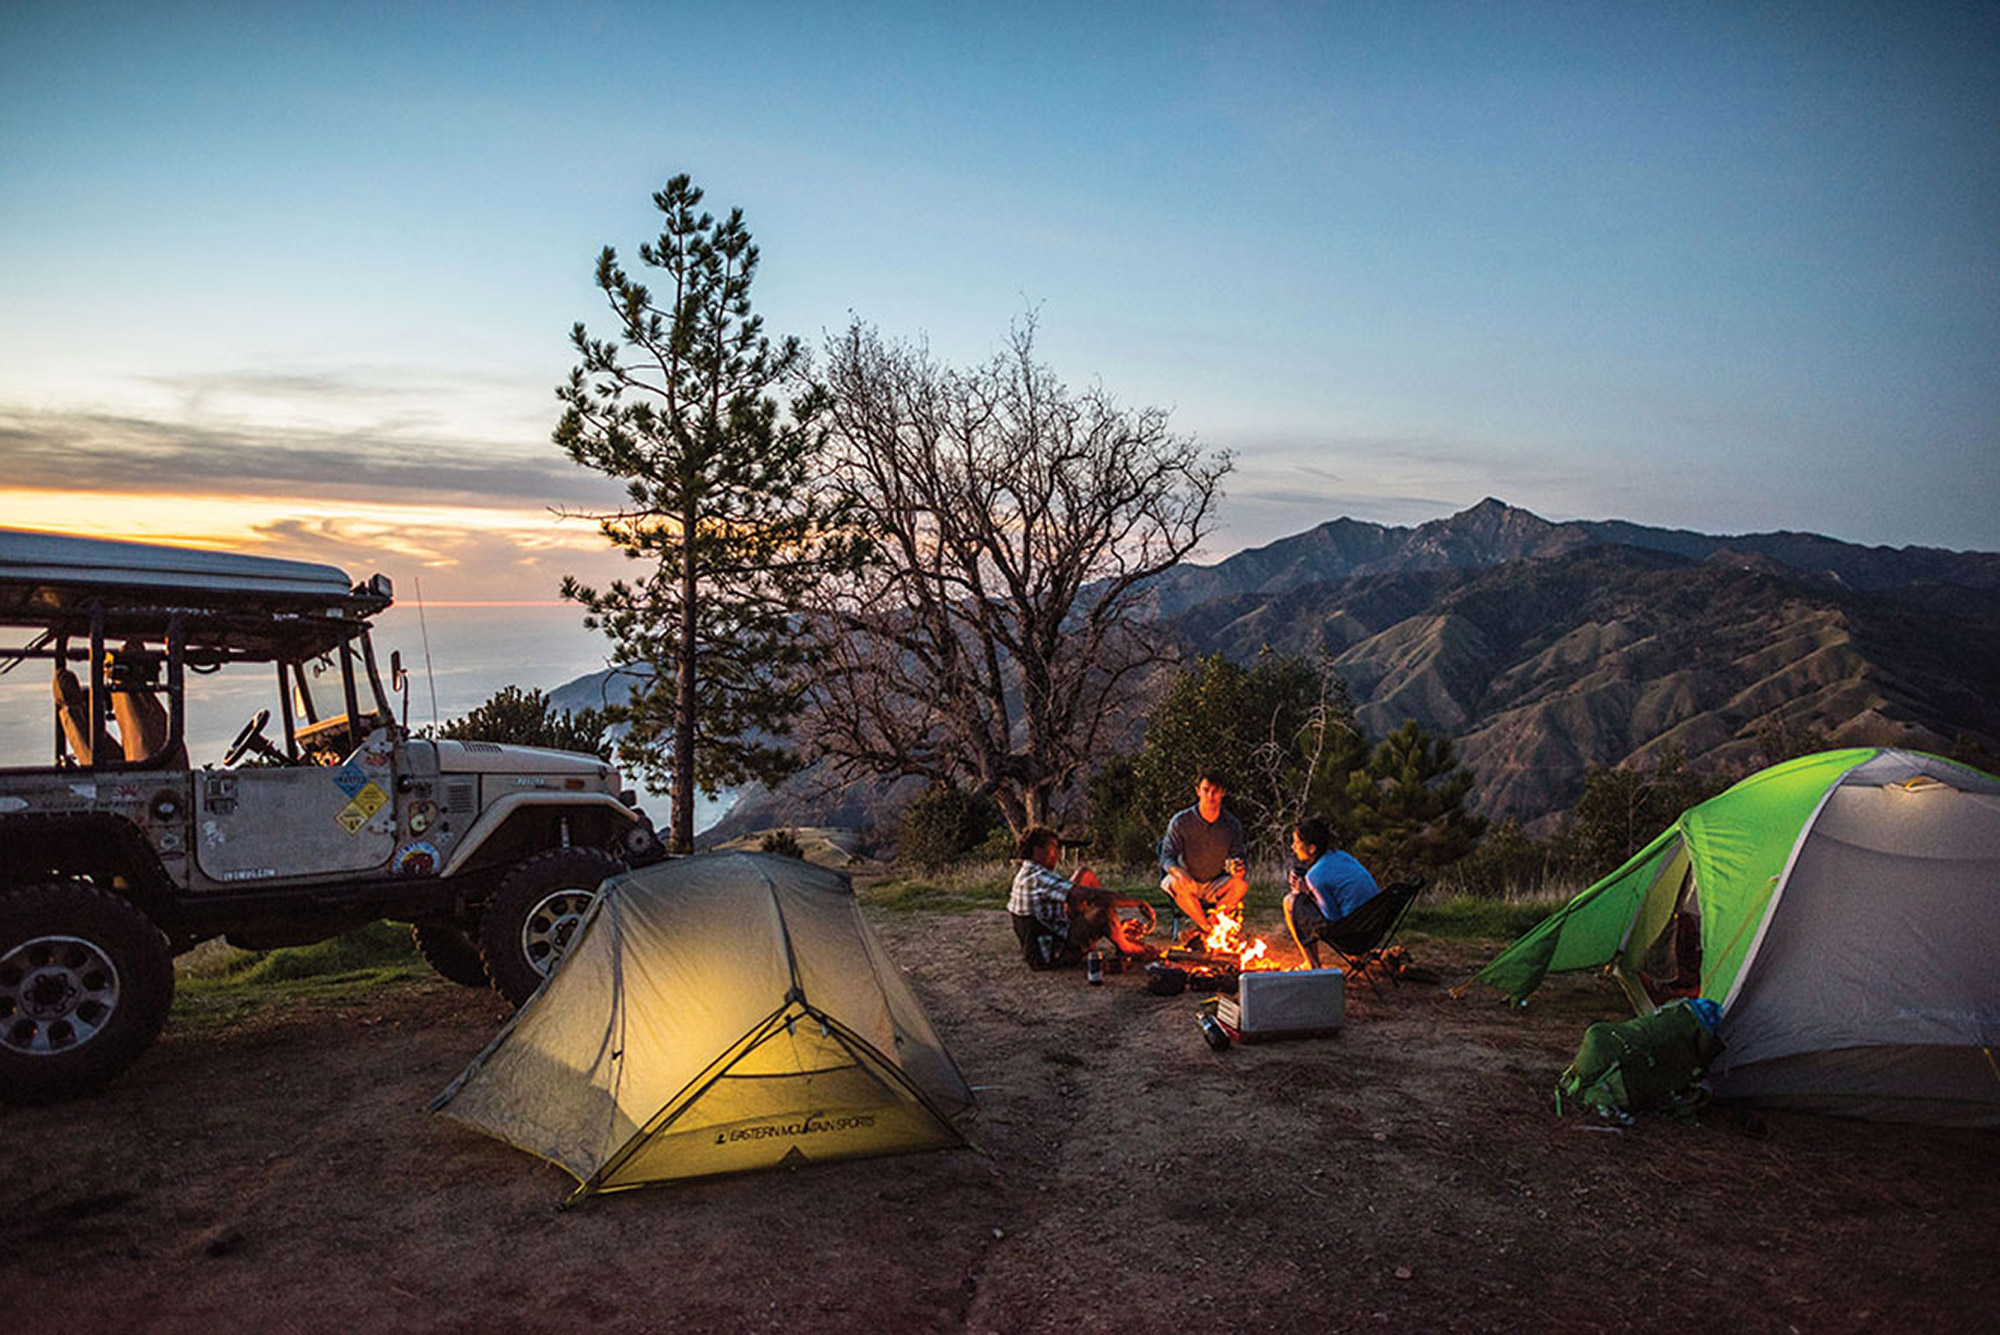 EMS---BIG-SUR--4959-Camping